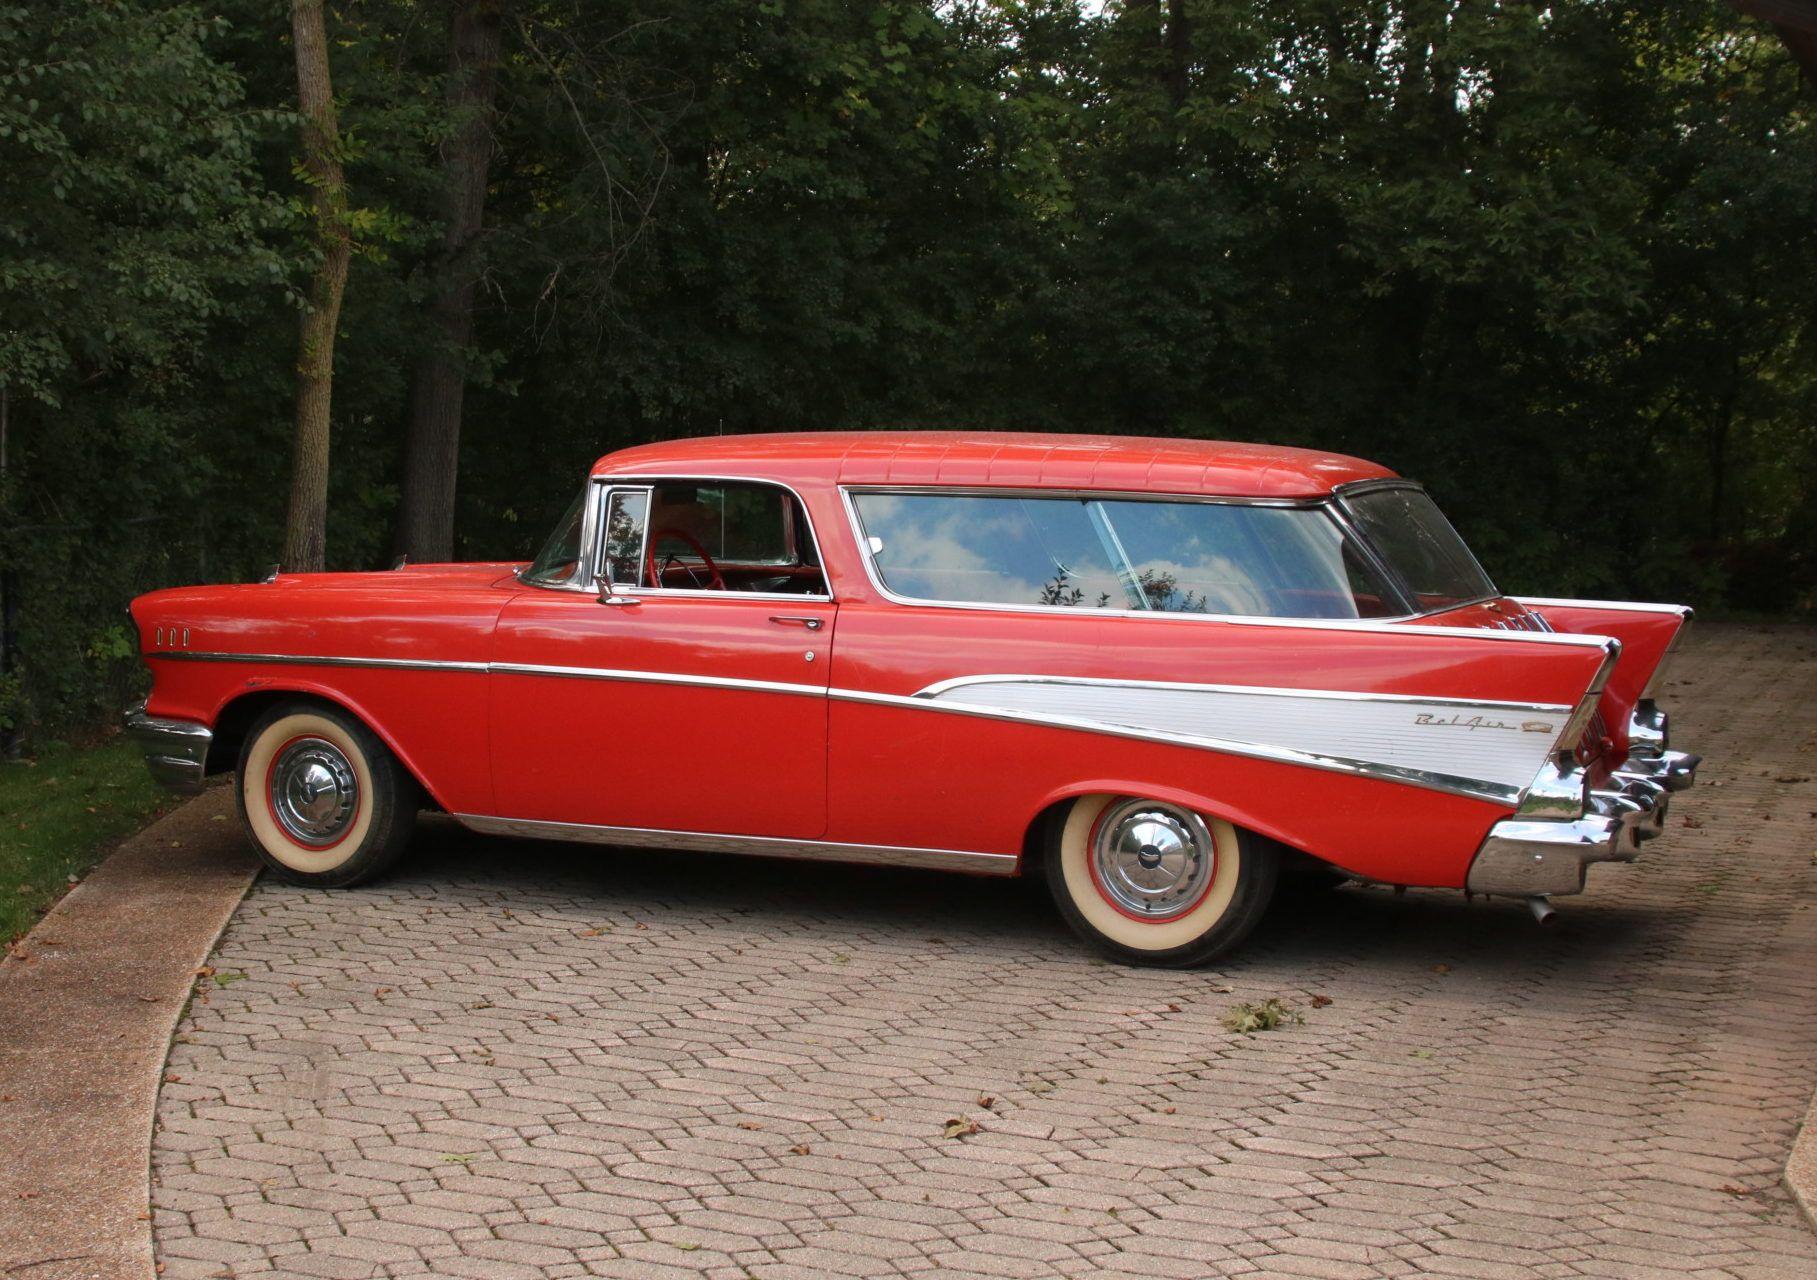 1957 Chevrolet Bel Air Nomad Station Wagon 1957 Chevrolet